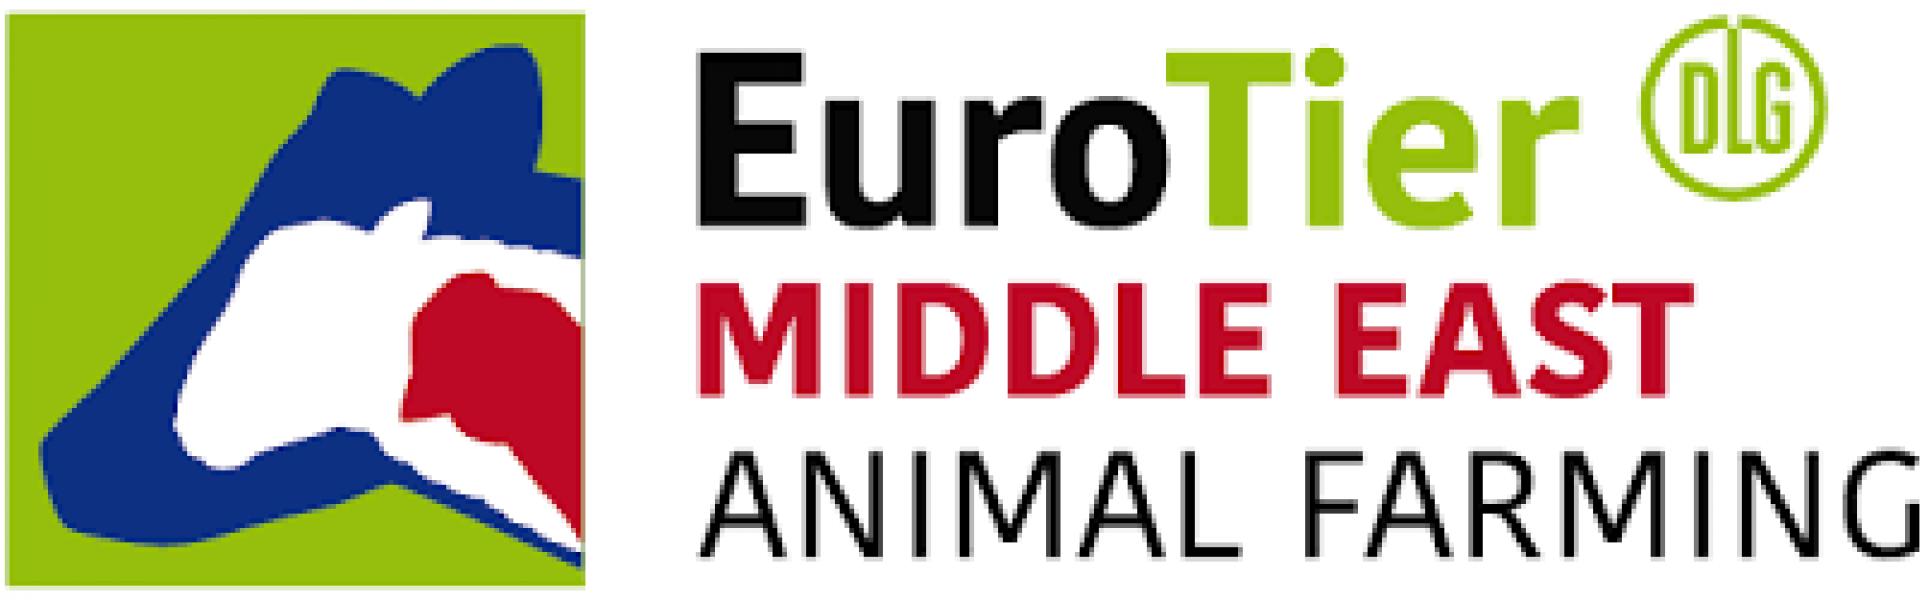 Logotipo de EuroTier Middle East